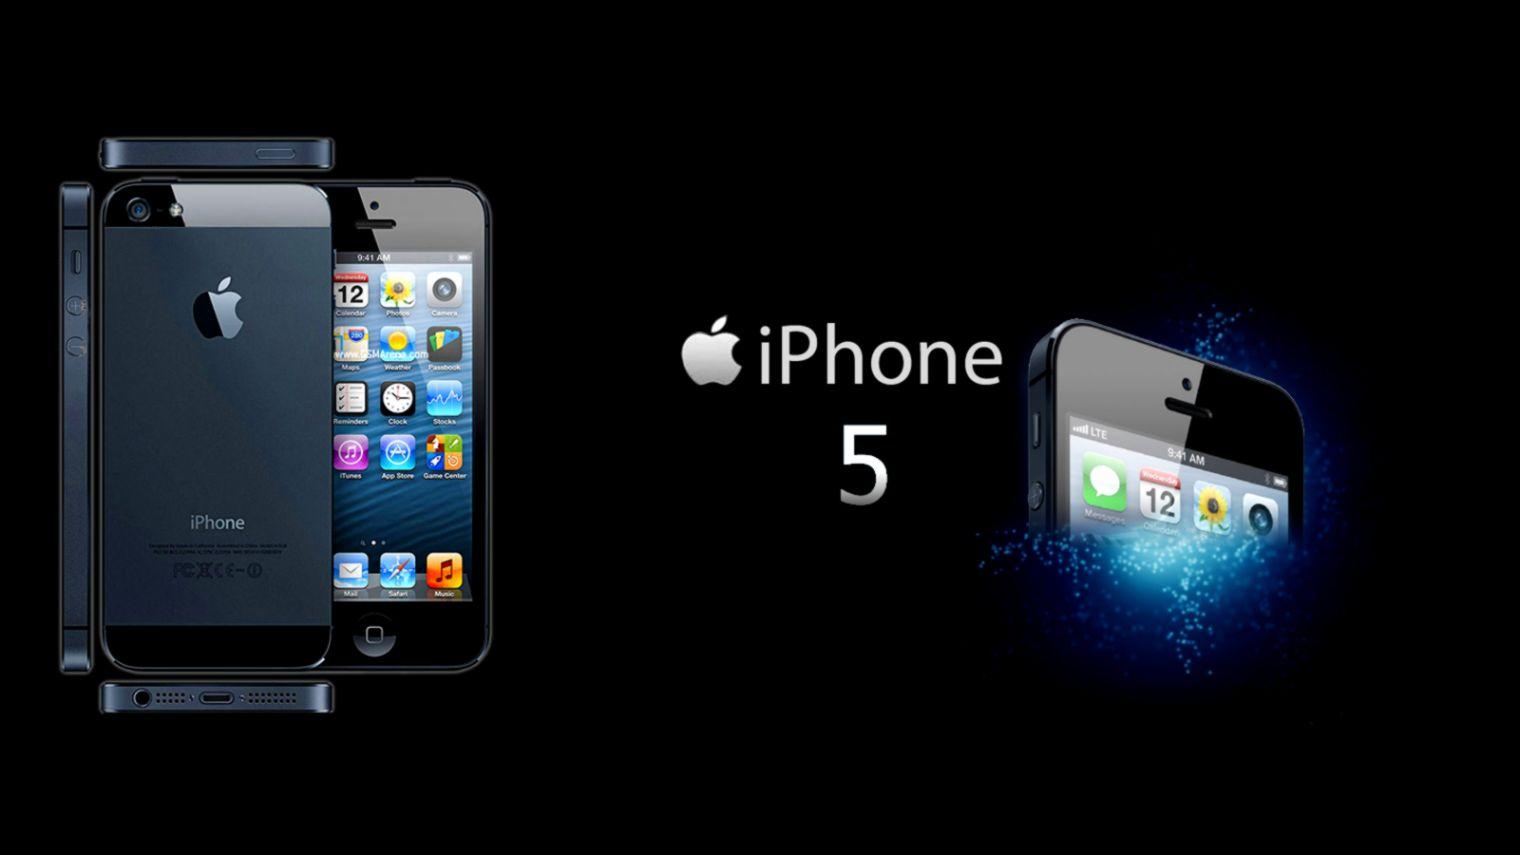 Most Inspiring   Wallpaper Horse Iphone 5s - apple-iphone-5-original-wallpaper  Perfect Image Reference_336562.jpg